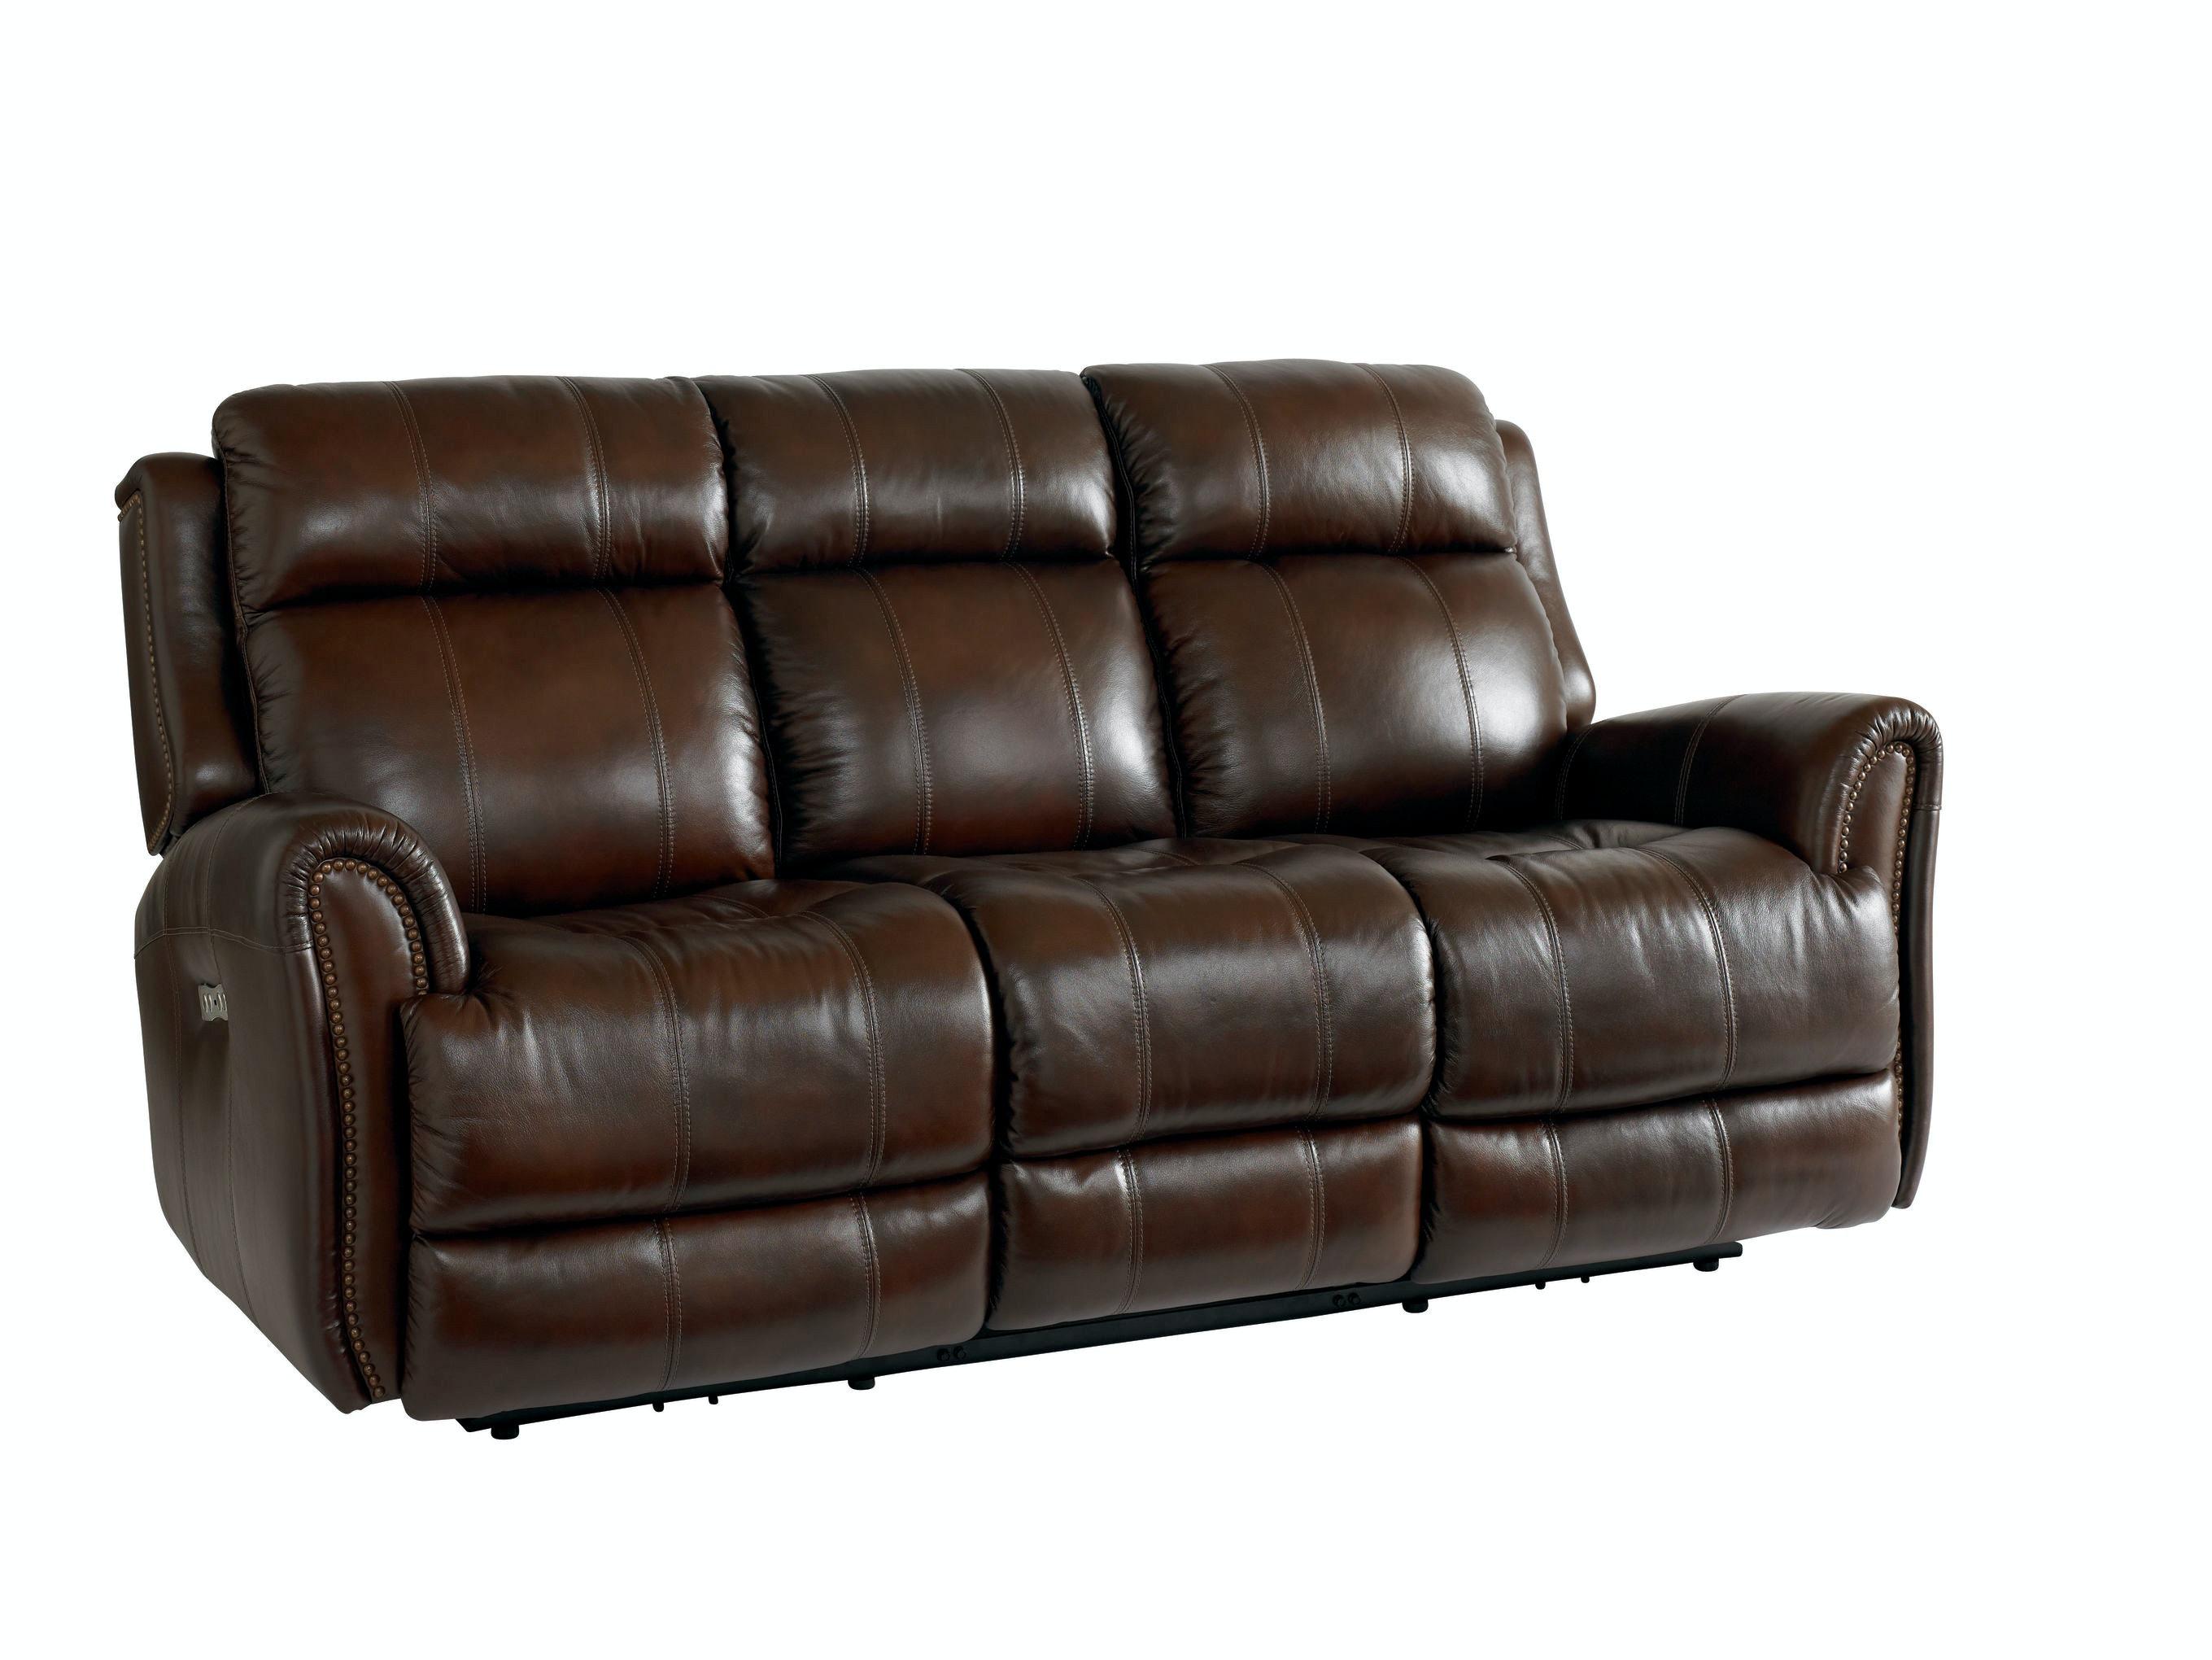 Bassett Marquee Power Reclining Sofa 742050